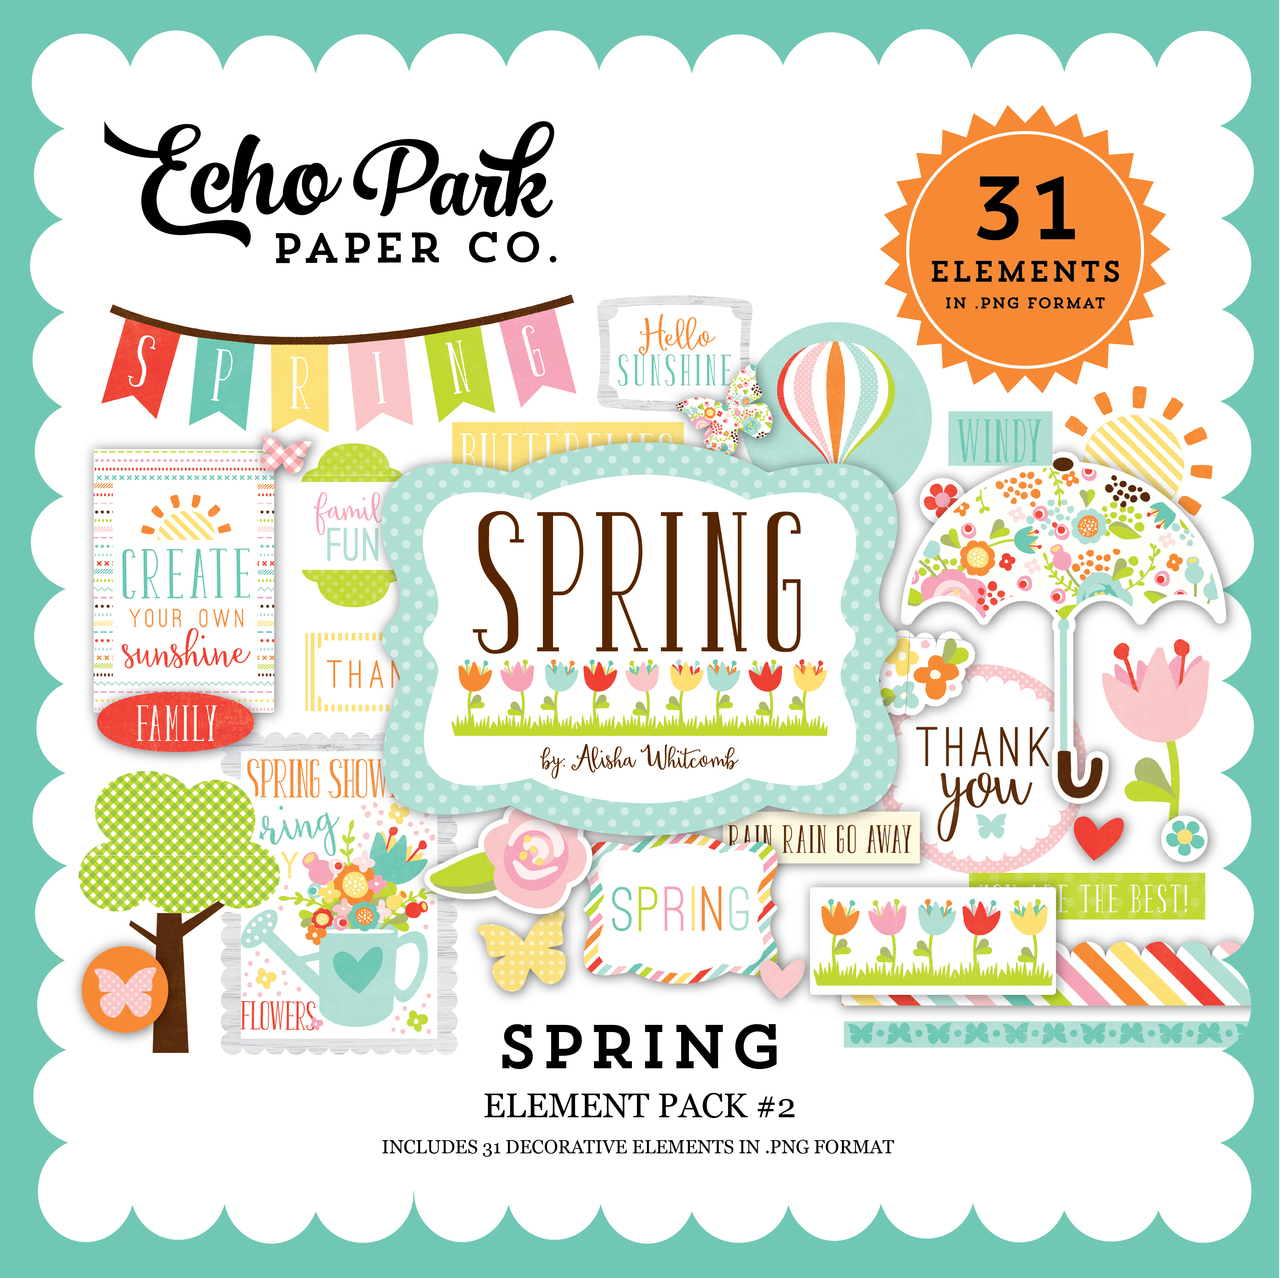 Spring Elements Pack #2